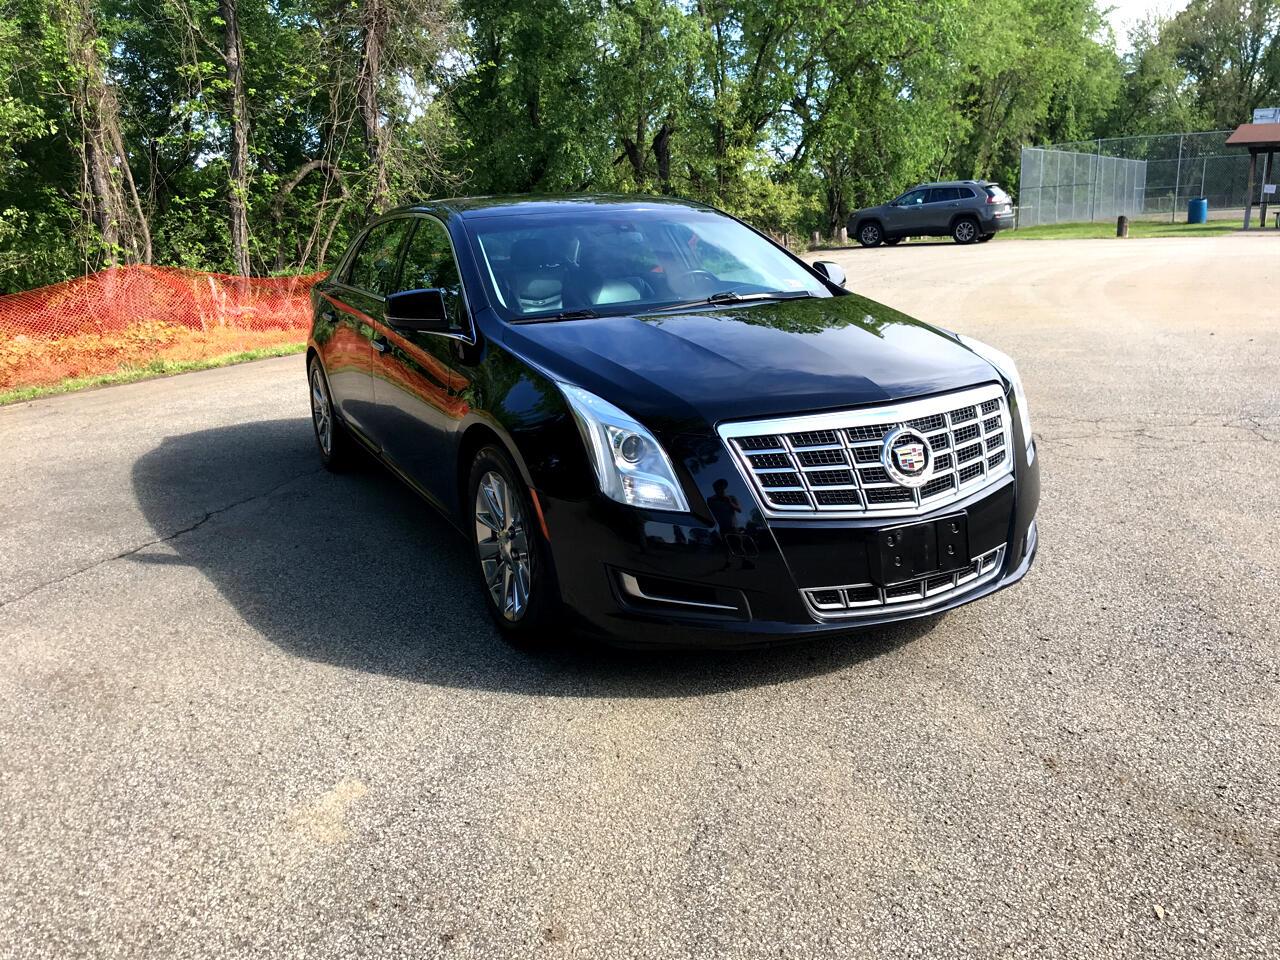 Cadillac XTS Limousine 2015